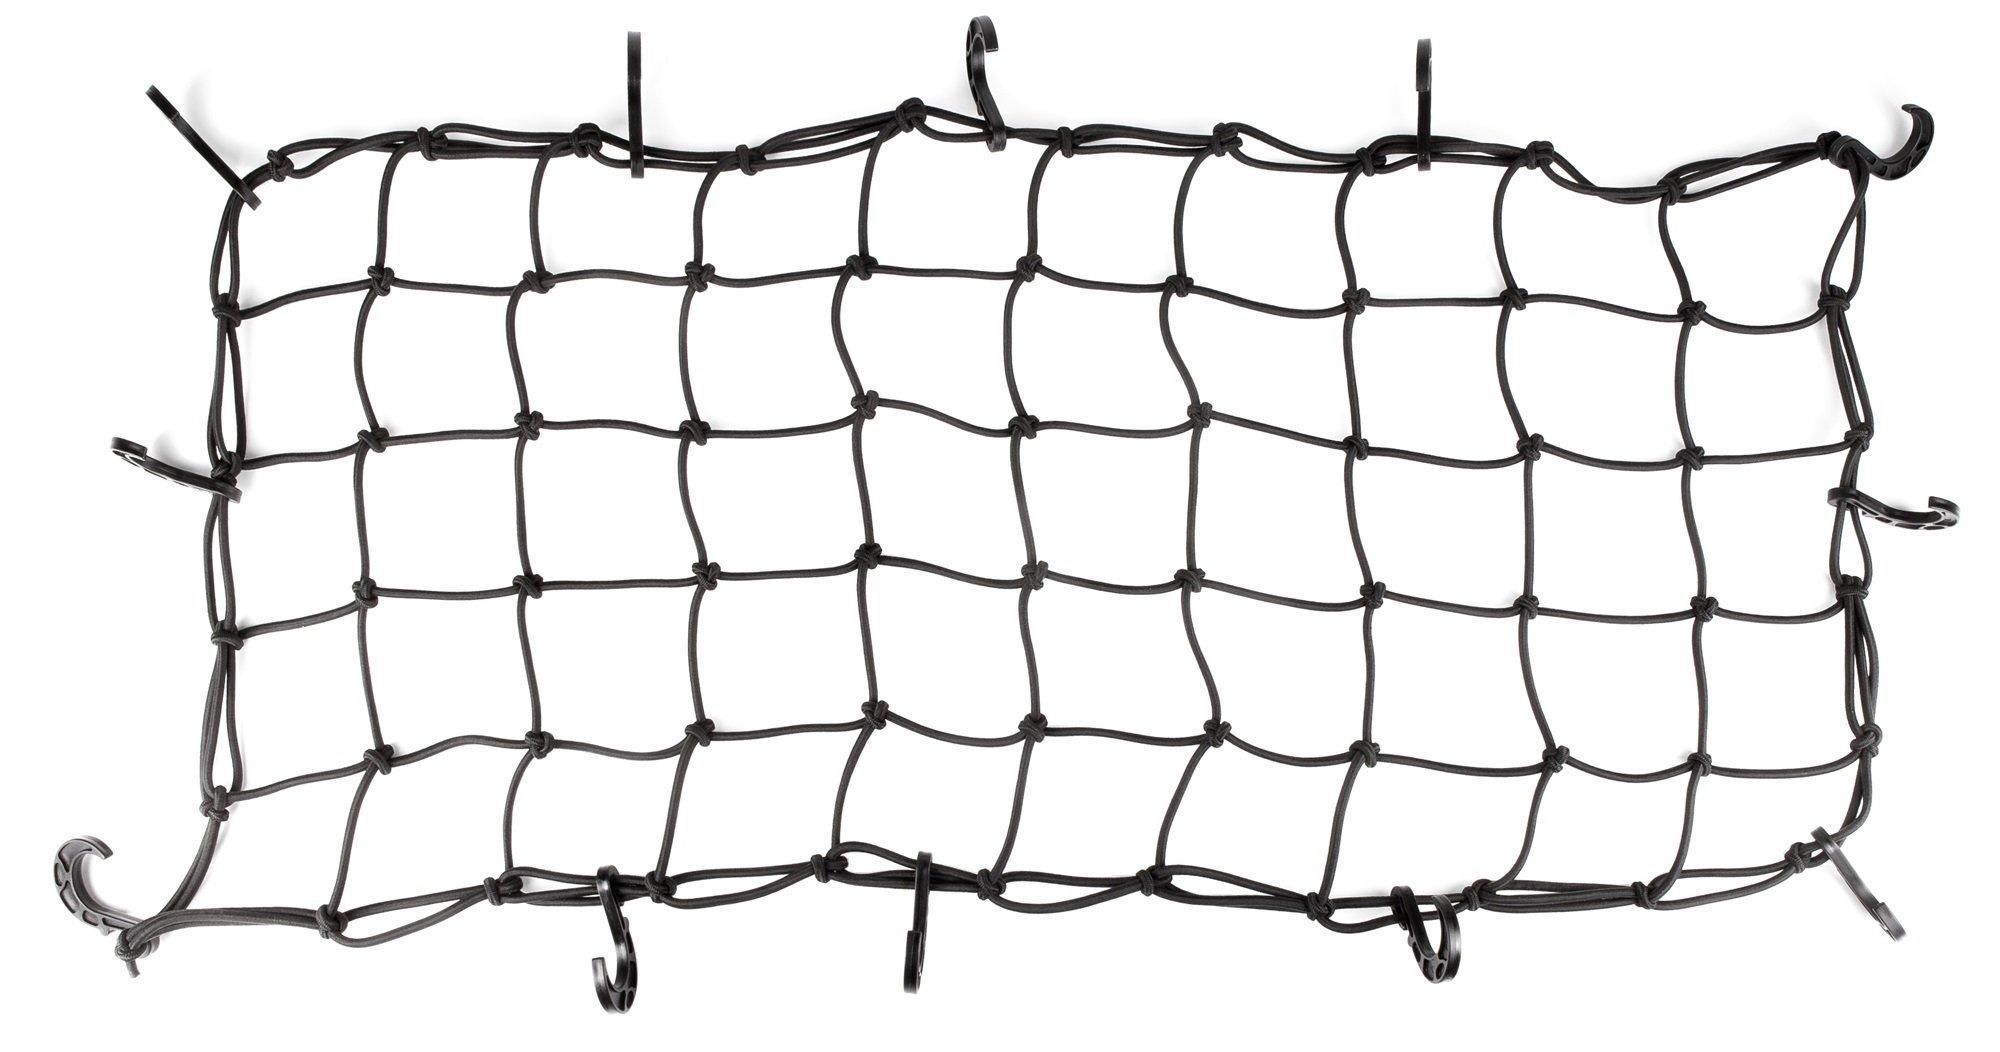 Reese Powersports (1881100) ATV Bungee Cargo Net